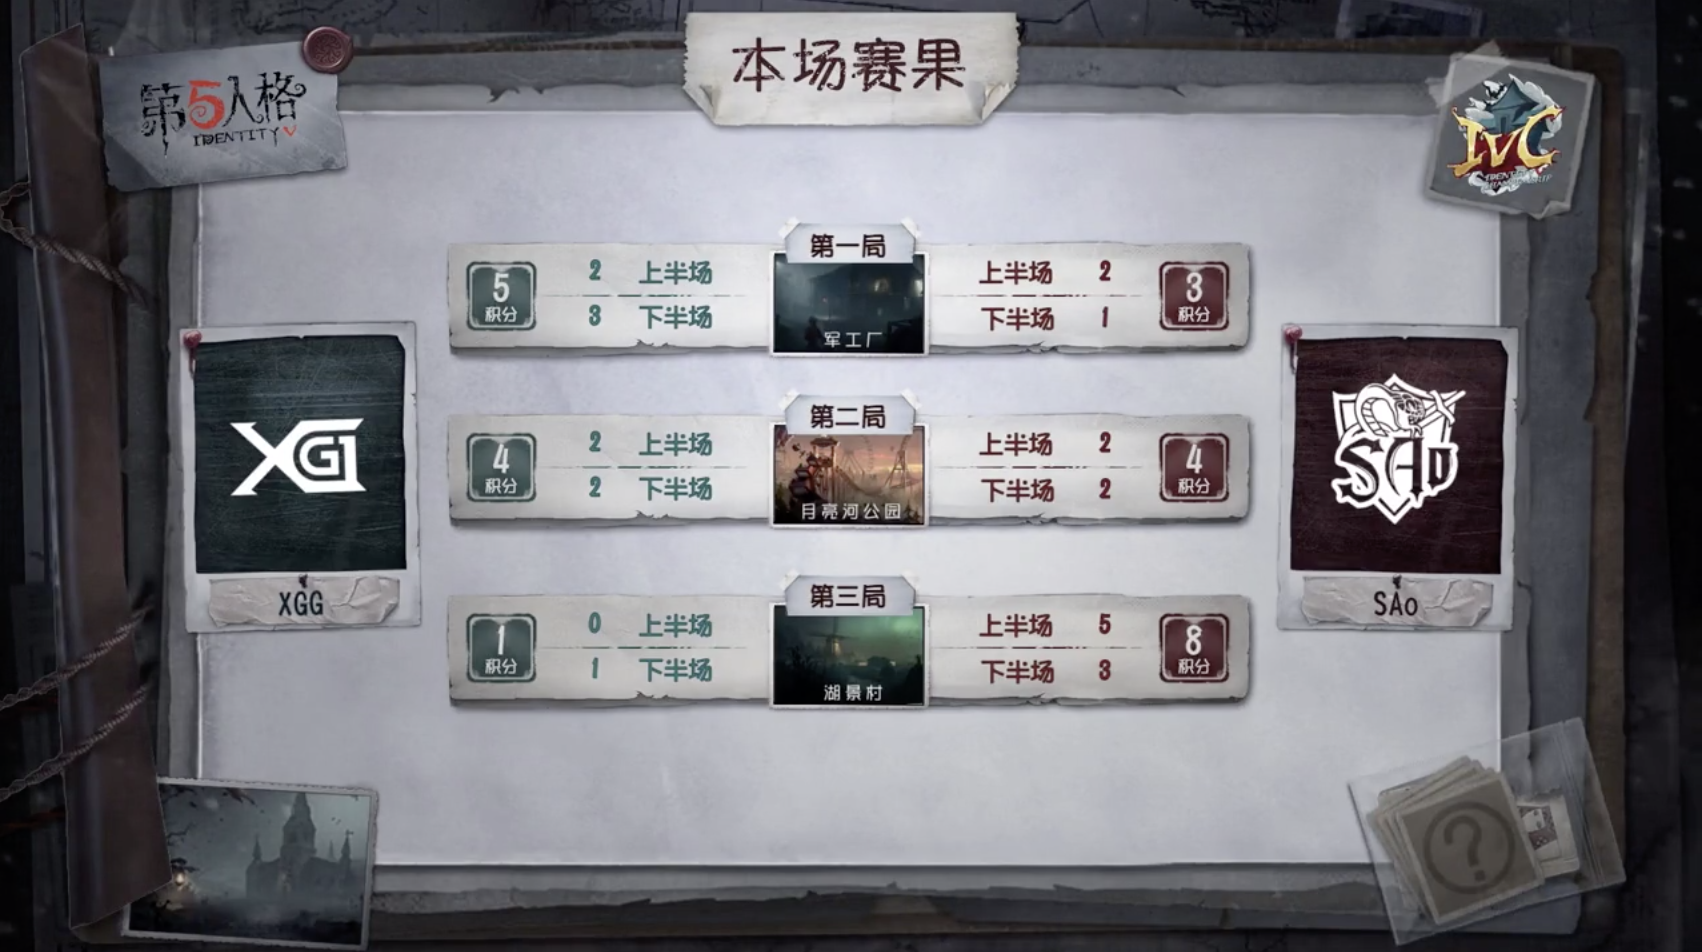 10月20日 XGG vs SAo小组赛BO3第三局